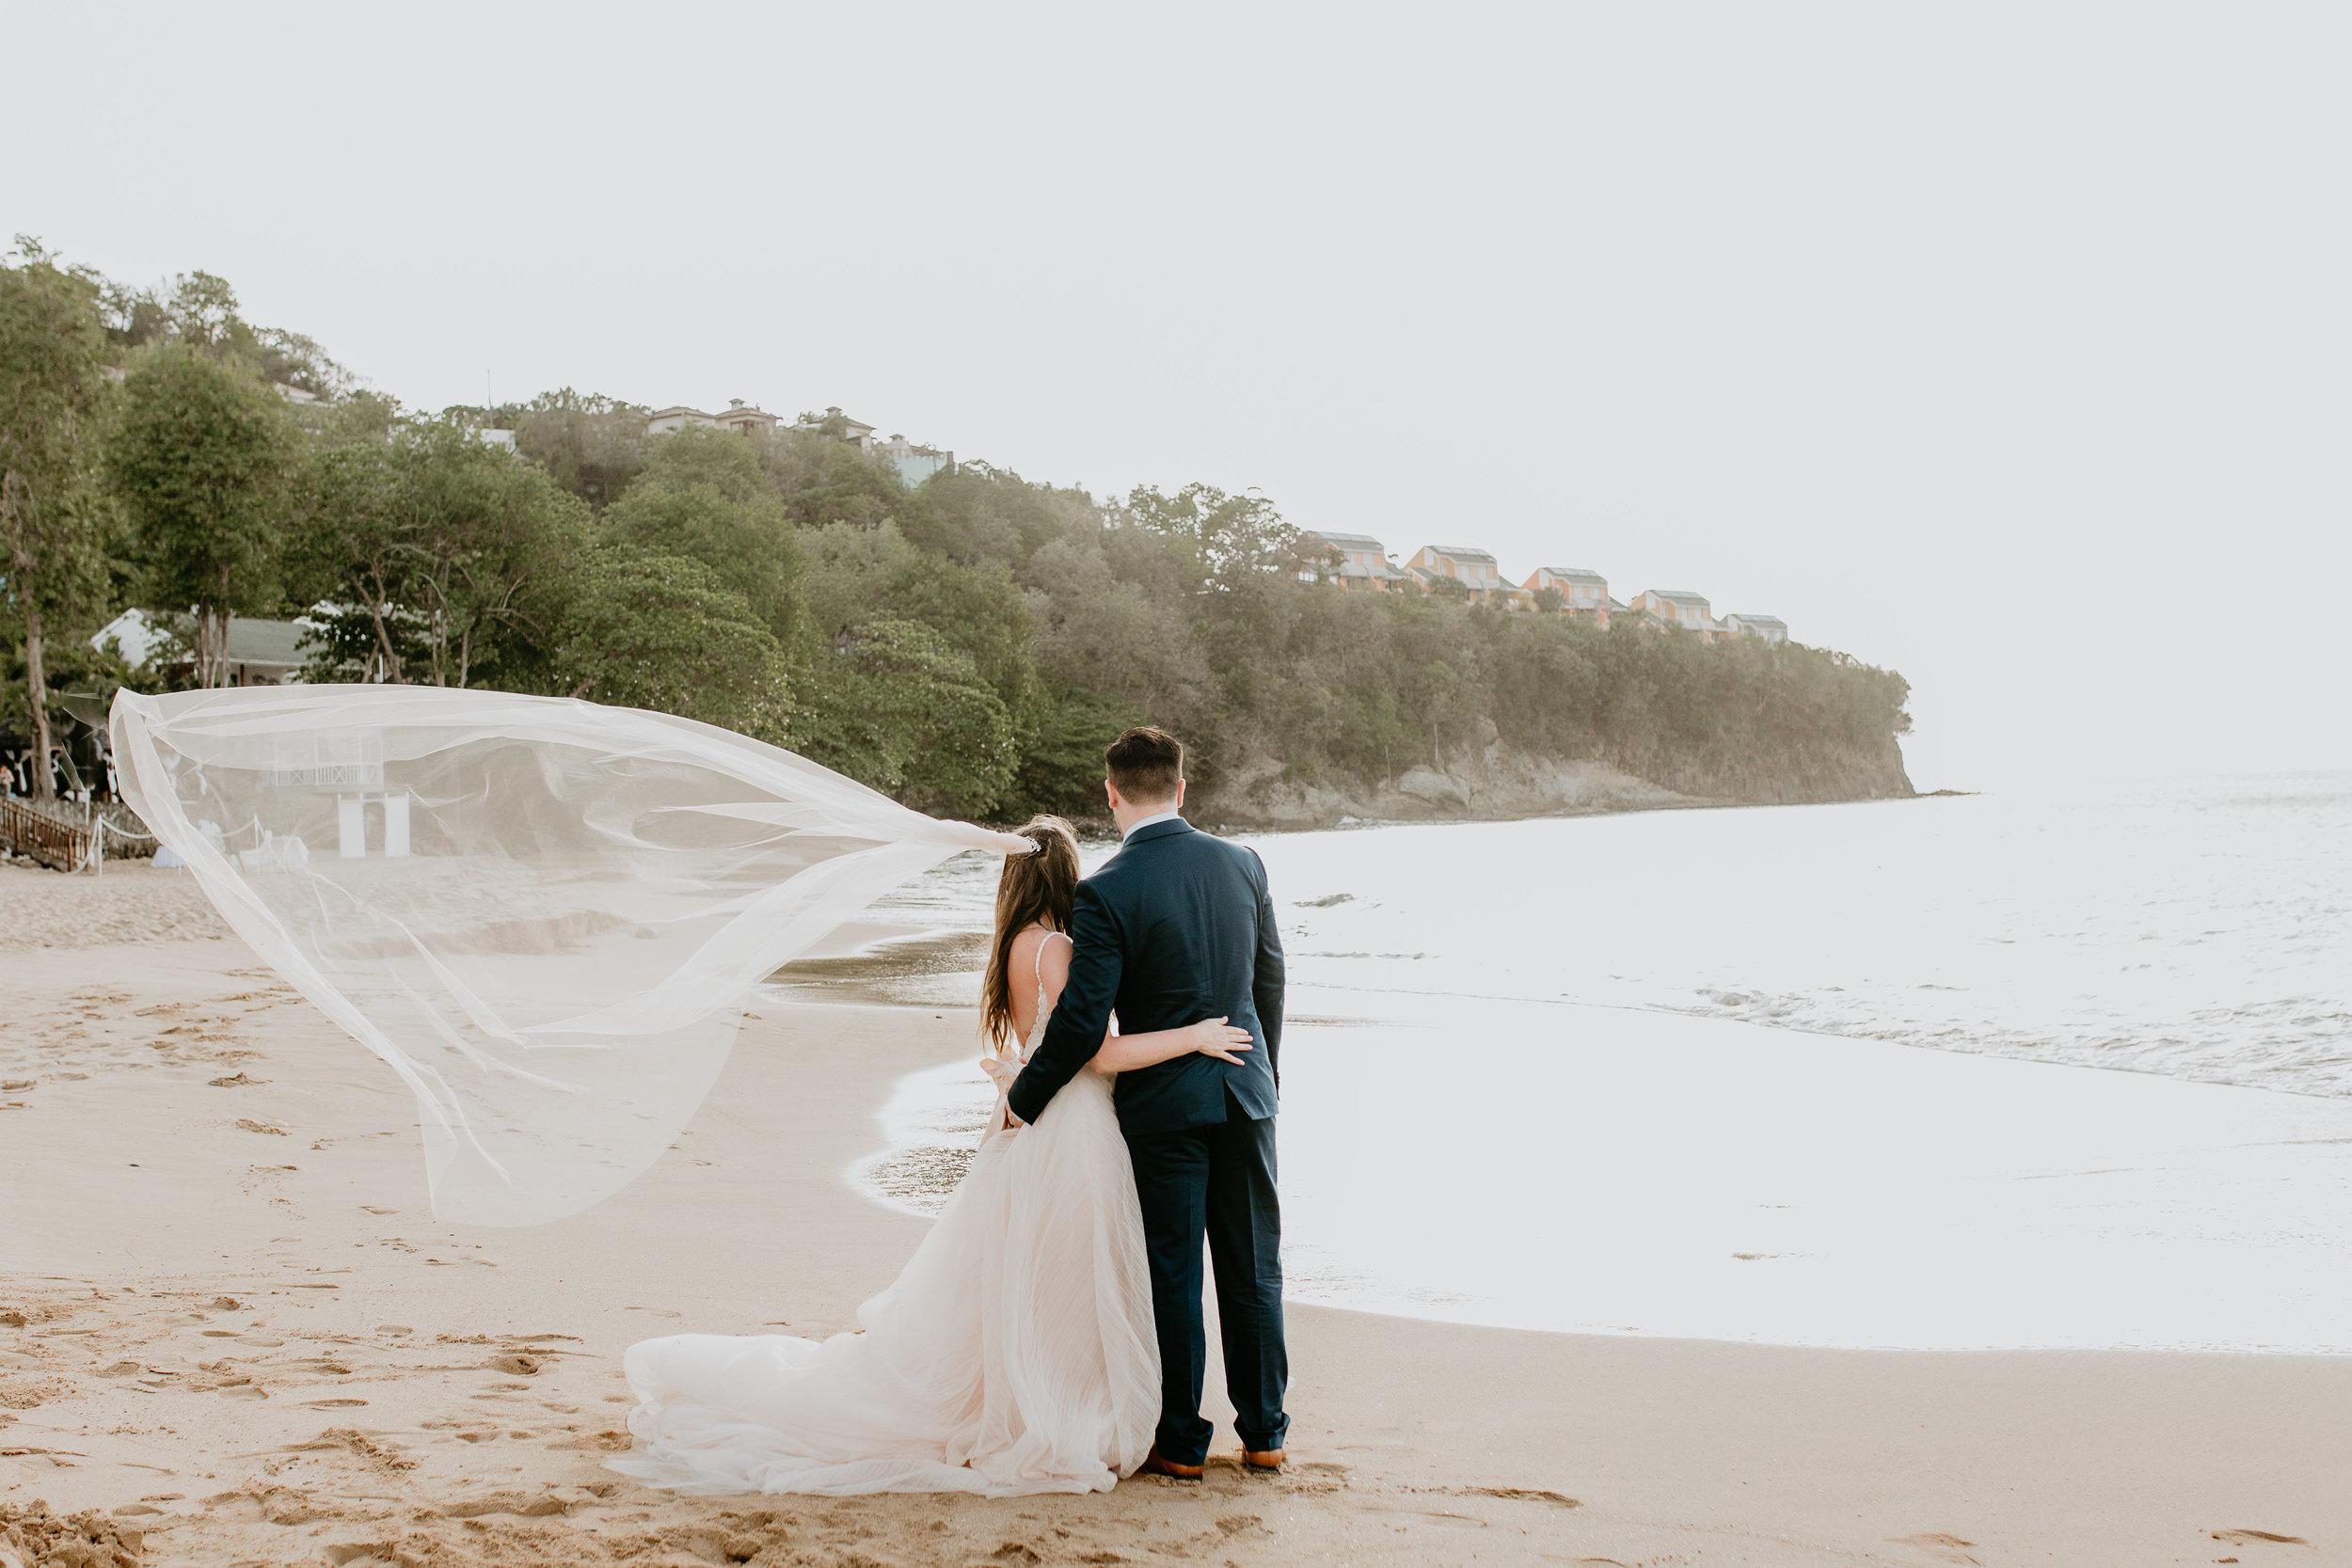 nicole-daacke-photography-destination-wedding-in-st-lucia-sandals-la-toc-intimate-island-wedding-carribean-elopement-photographer-chill-island-wedding-93.jpg